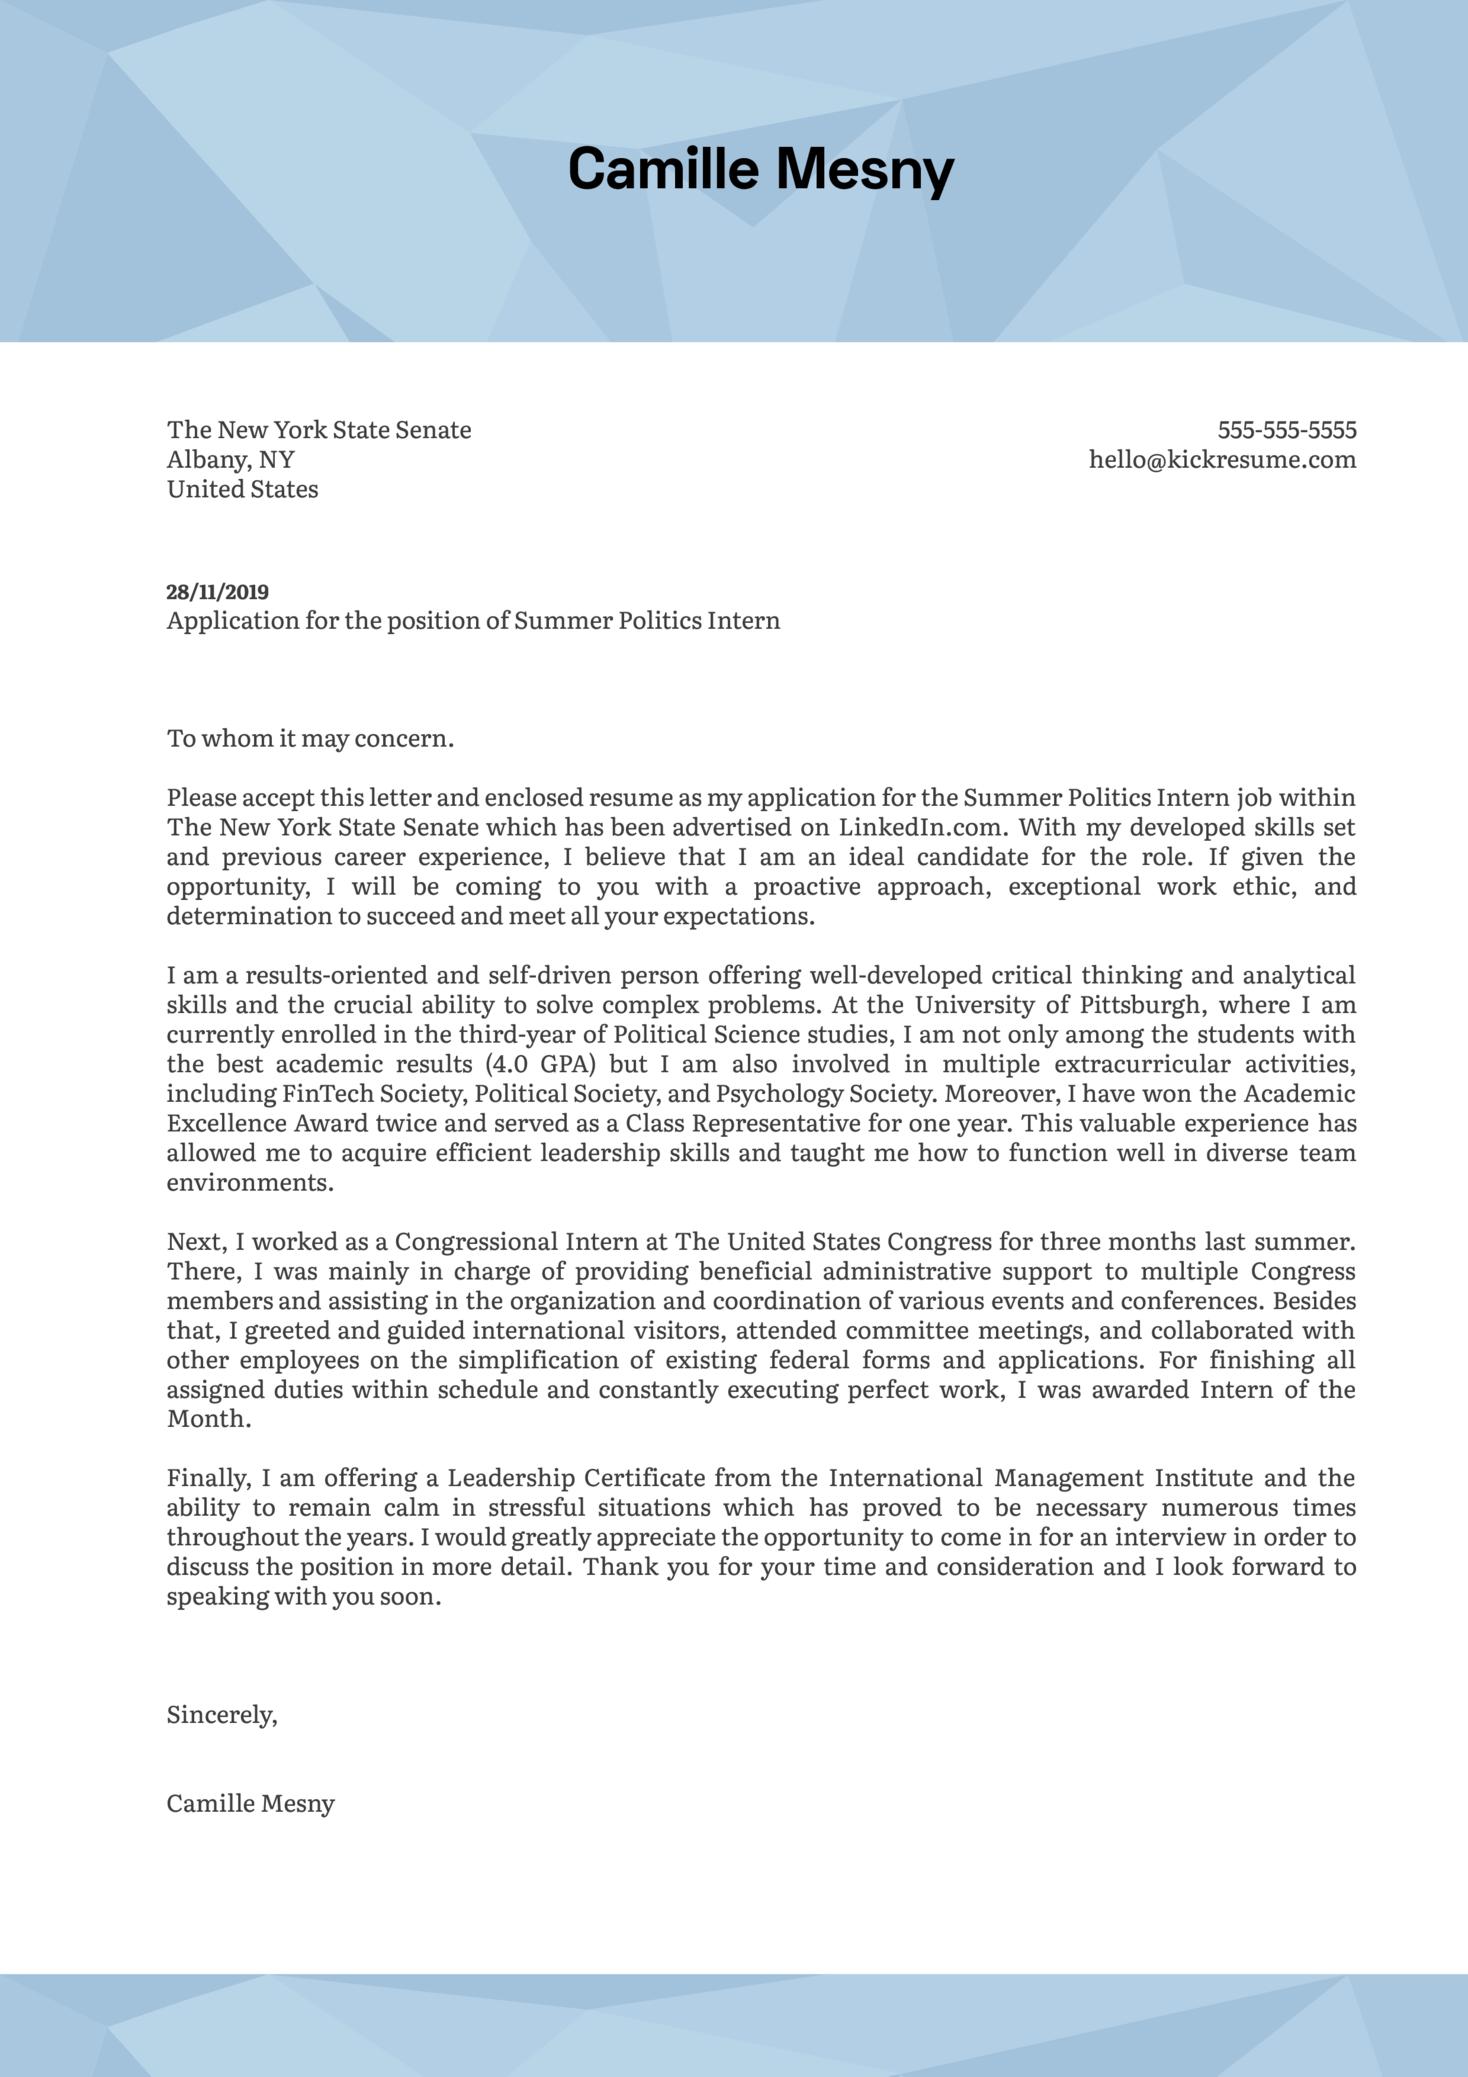 Politics Internship Cover Letter Example